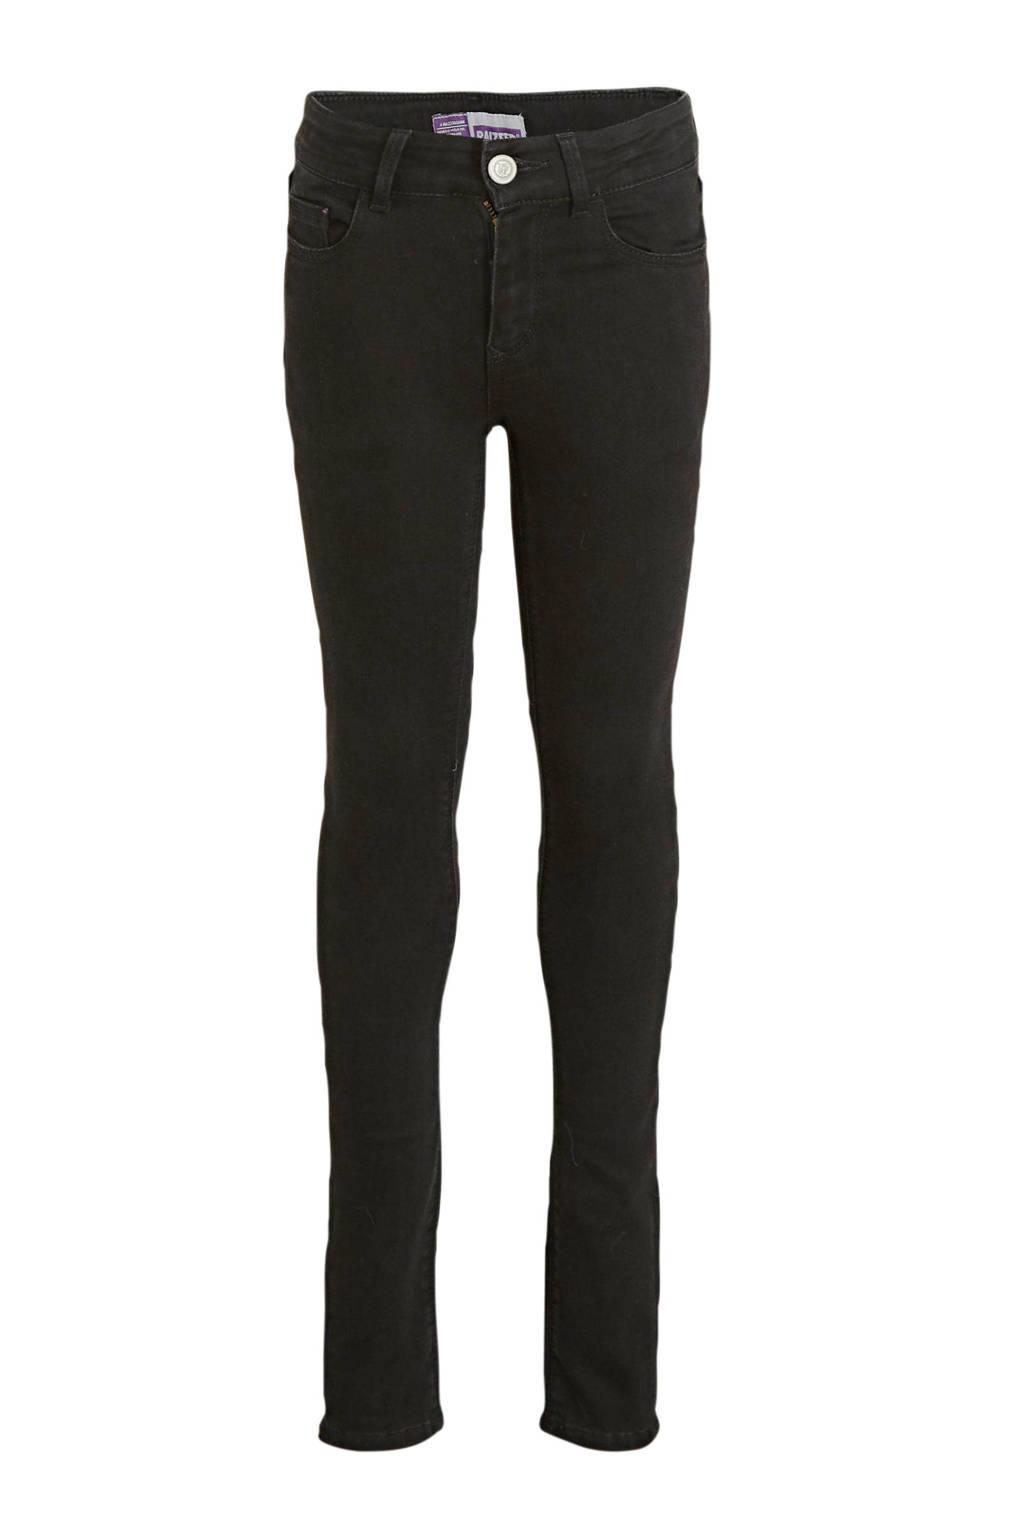 Raizzed high waist super skinny jeans Chelsea zwart, Zwart